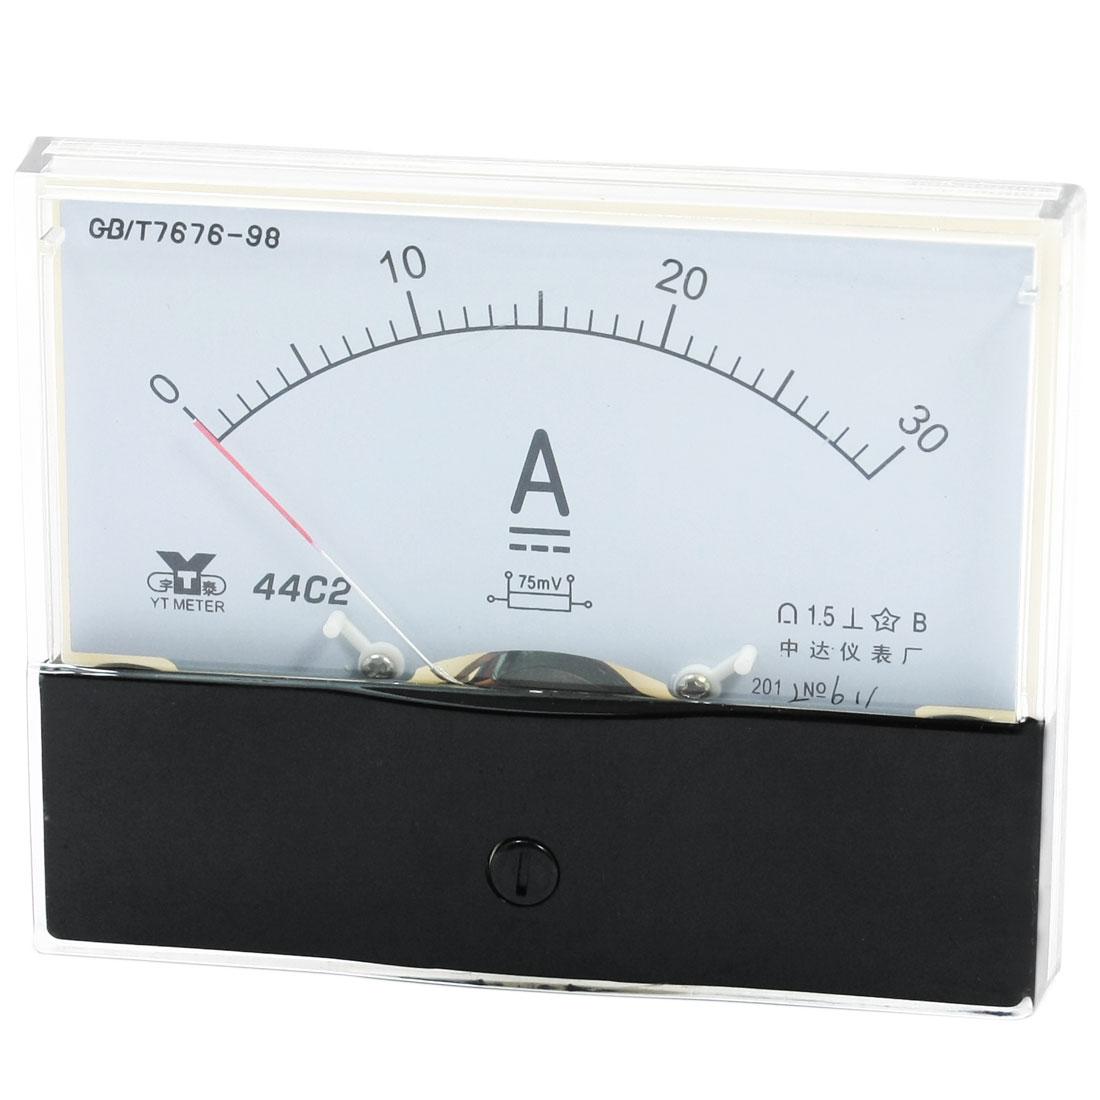 Rectangle Measurement Tool Analog Panel Ammeter Gauge DC 0 - 30A Measuring Range 44C2